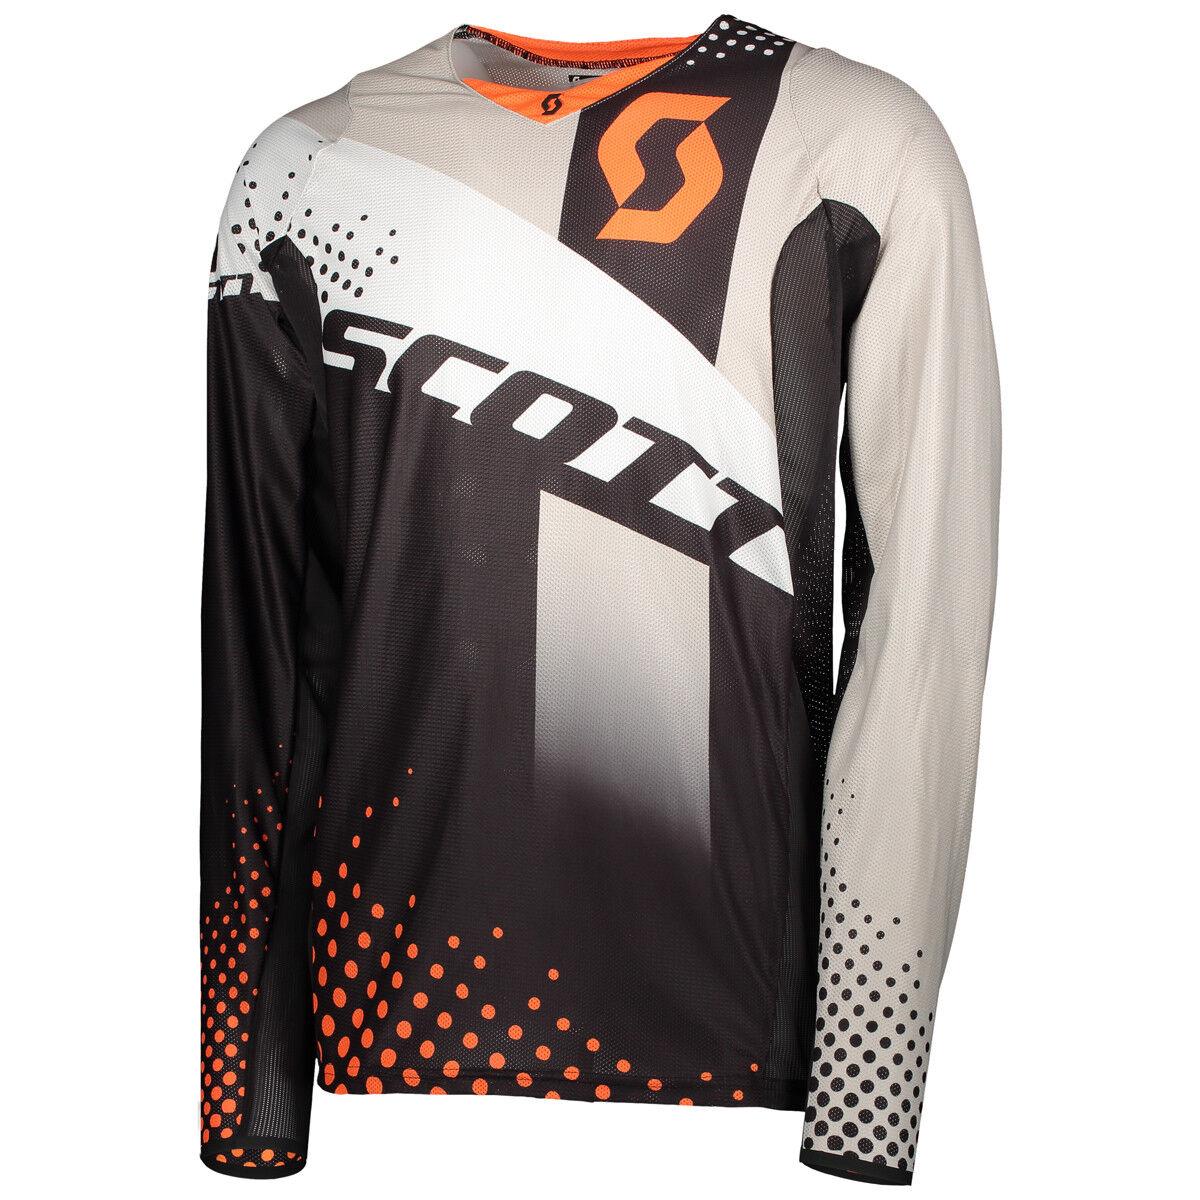 Scott 450 Angled MX Motocross Jersey / / / DH Fahrrad Trikot schwarz/Orange 2018 1b9e0f